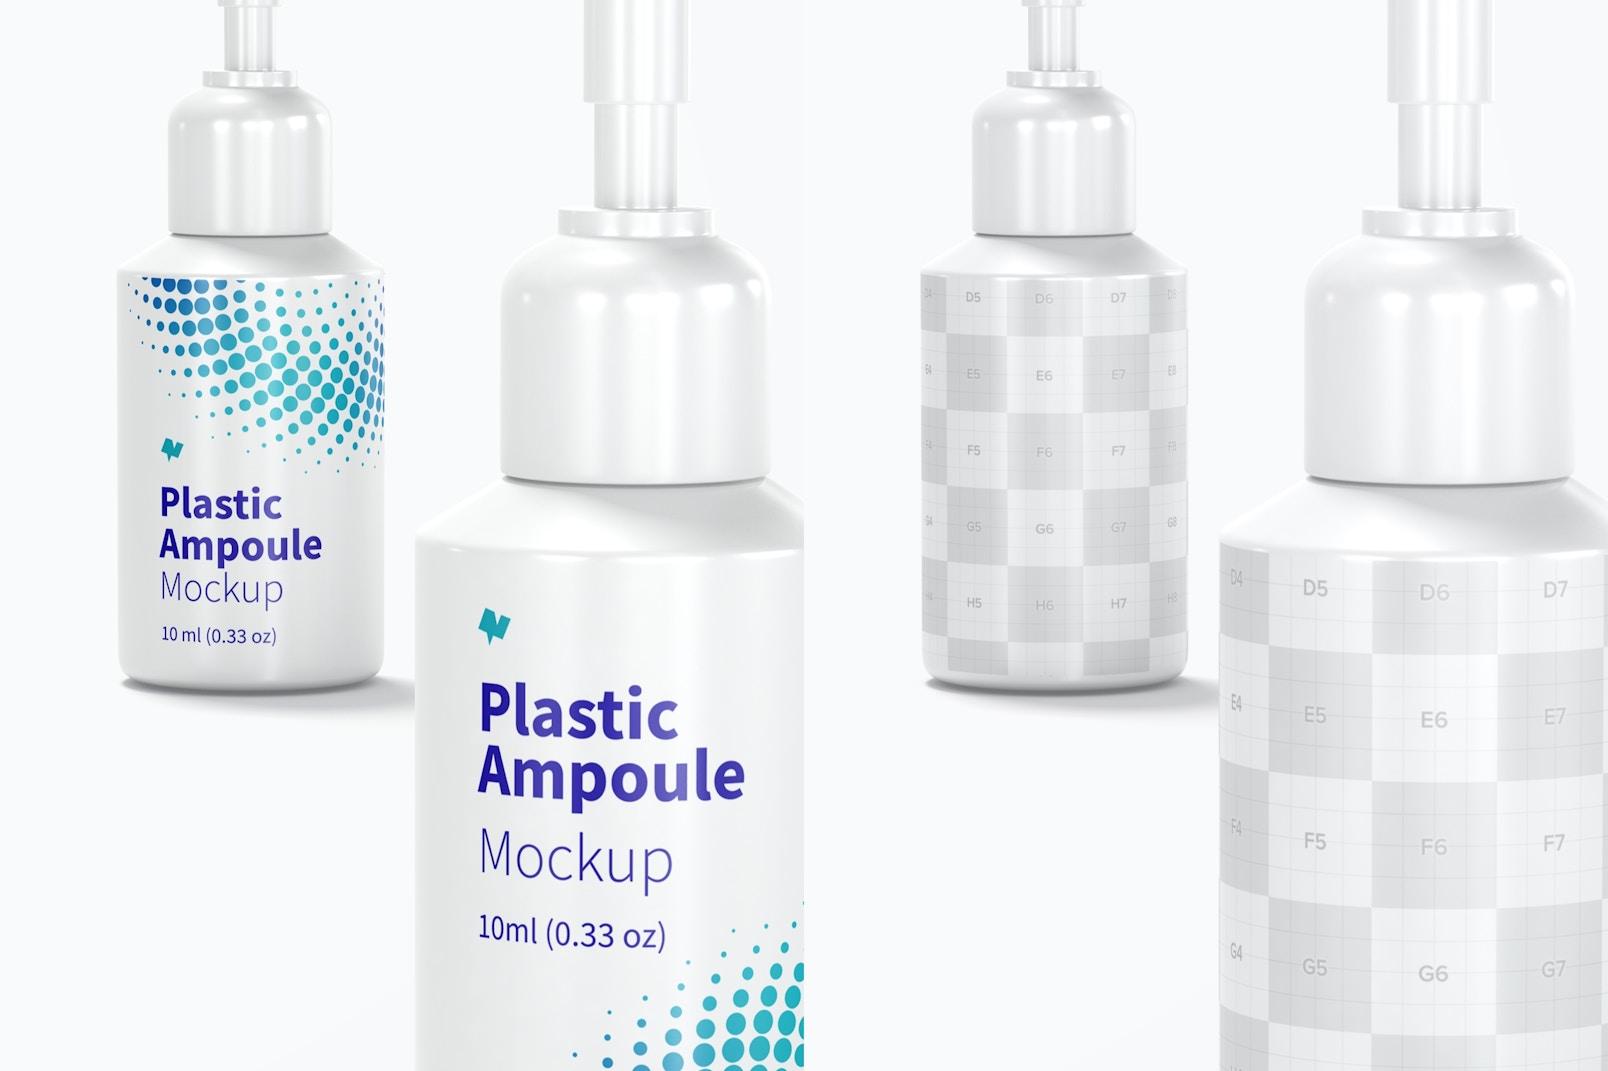 10 ml Plastic Ampoules Mockup, Close Up